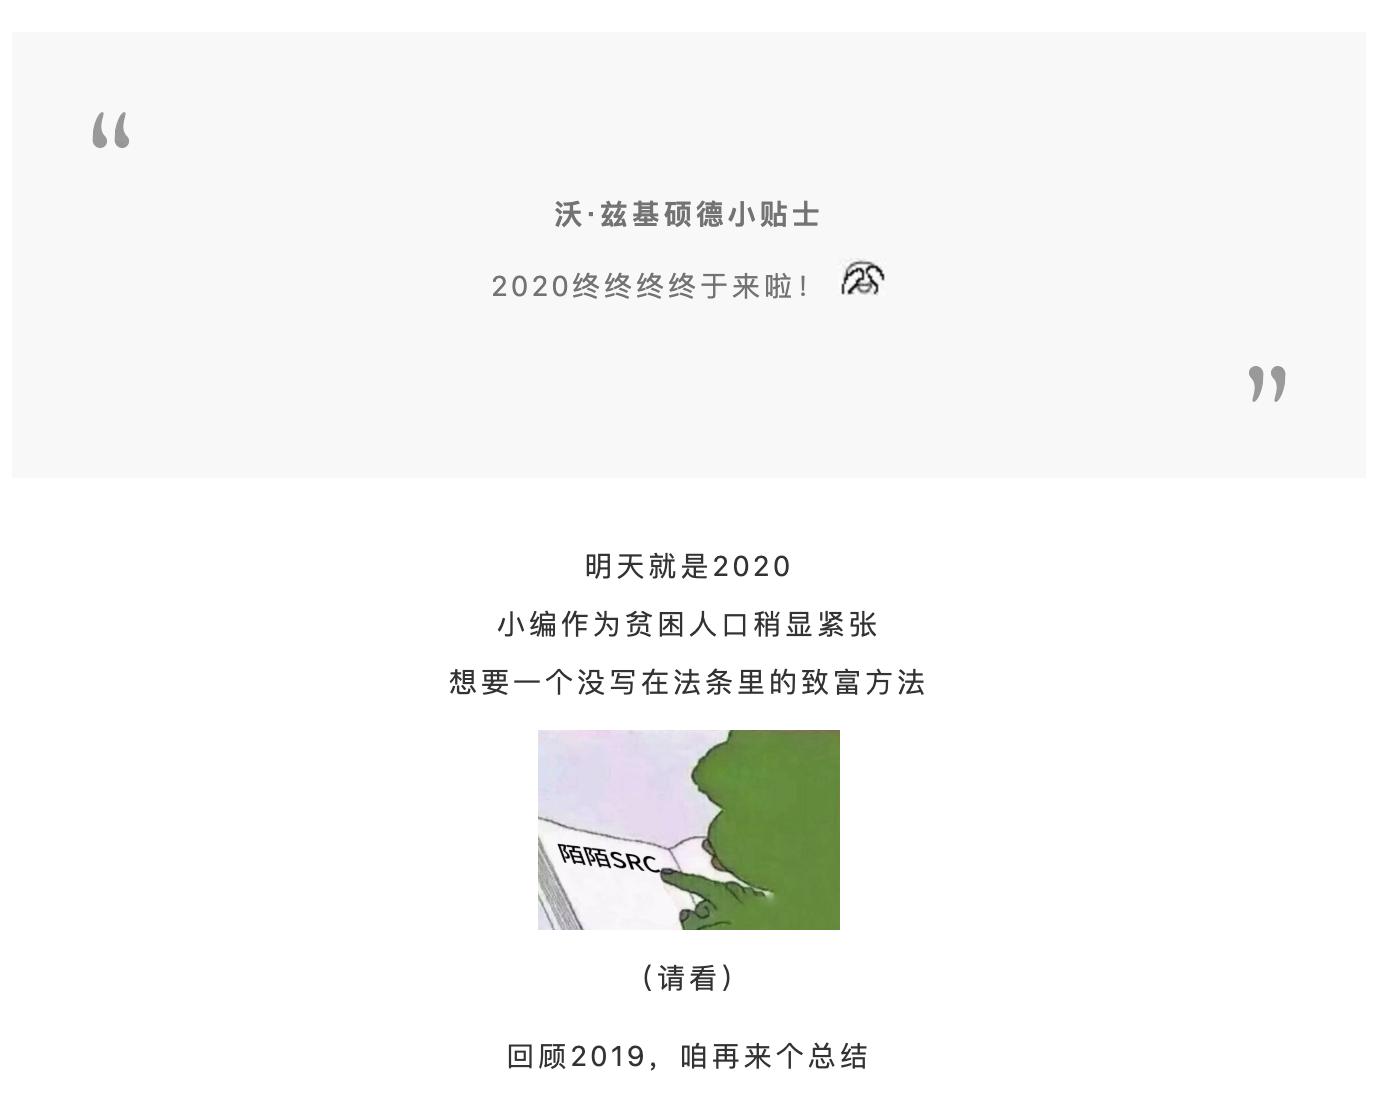 https://momo-mmsrc.oss-cn-hangzhou.aliyuncs.com/img-a3416b0a-906c-3861-b546-eba9668a225b.png